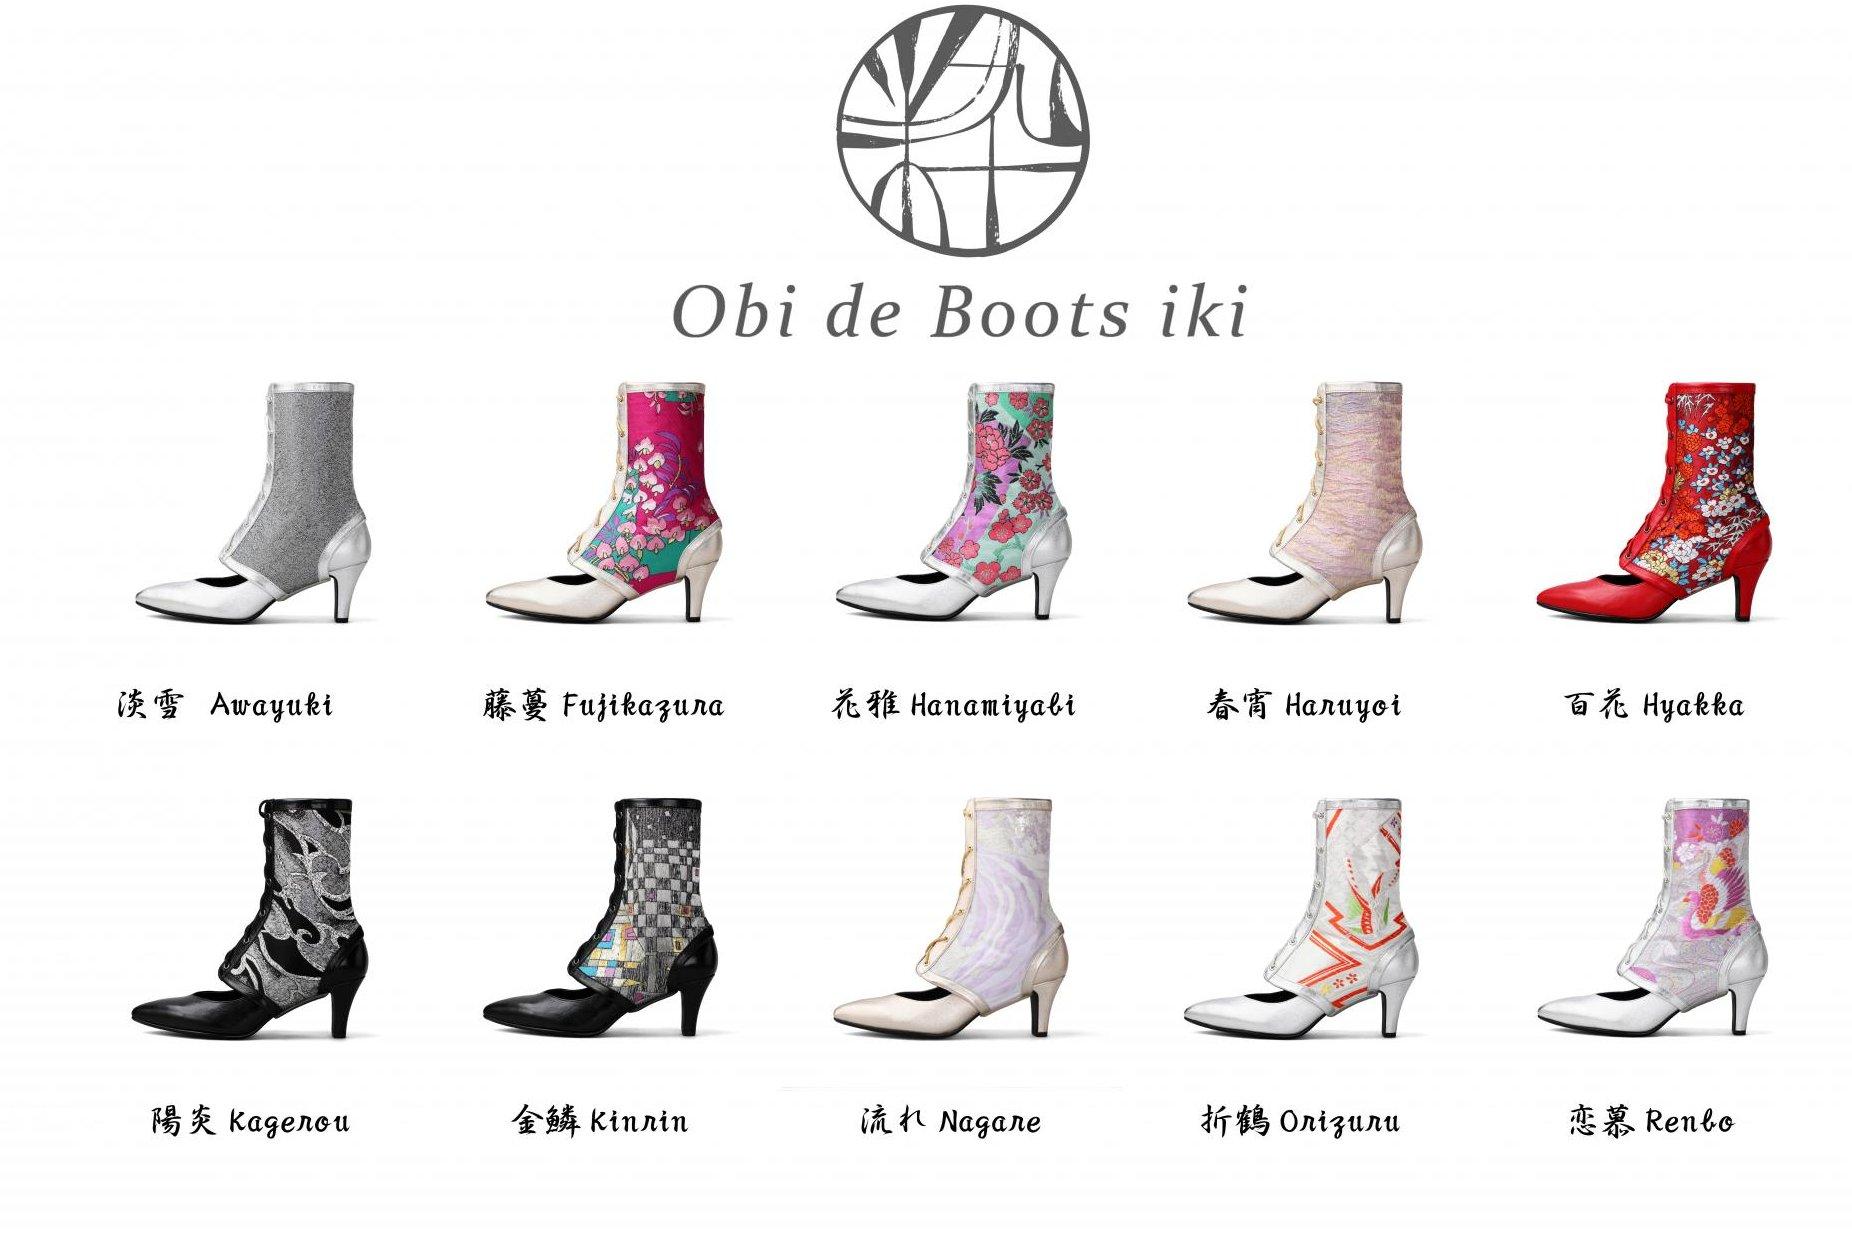 Obi de Boots iki 全種類